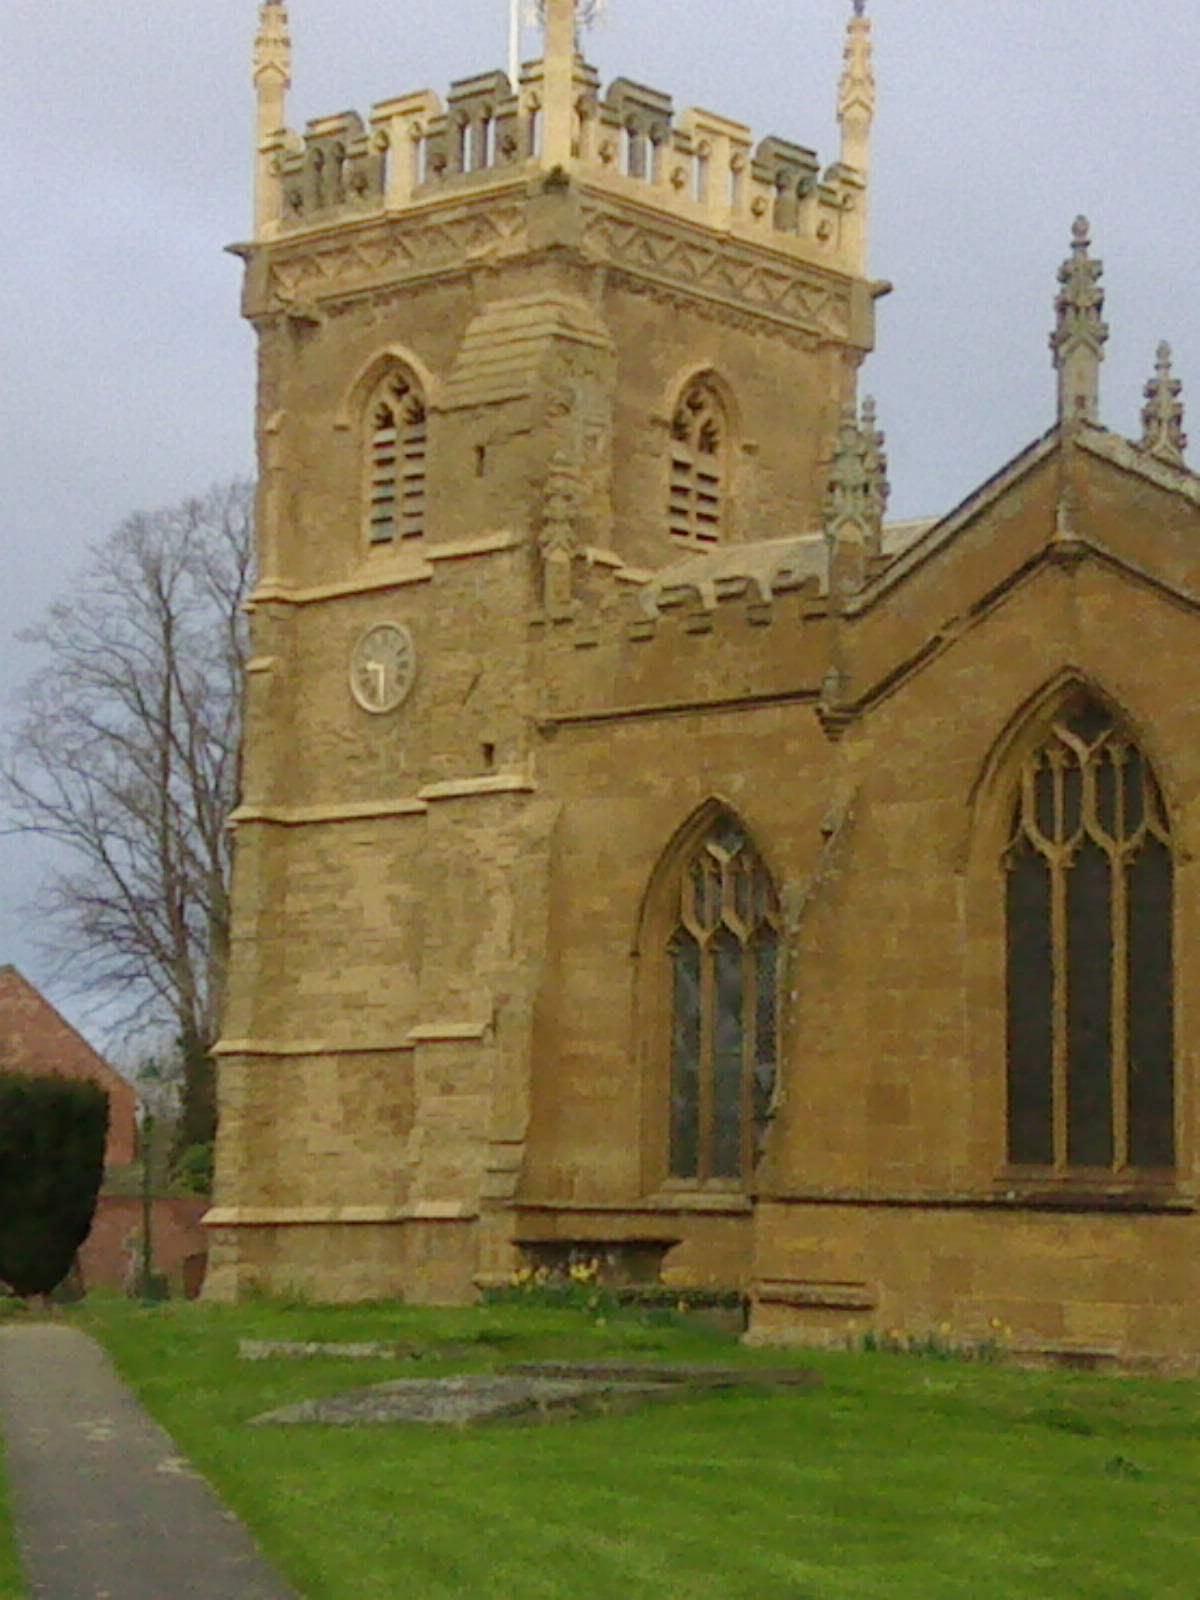 St Peter's Church, Kineton 8 bells 10-0-5 in F #